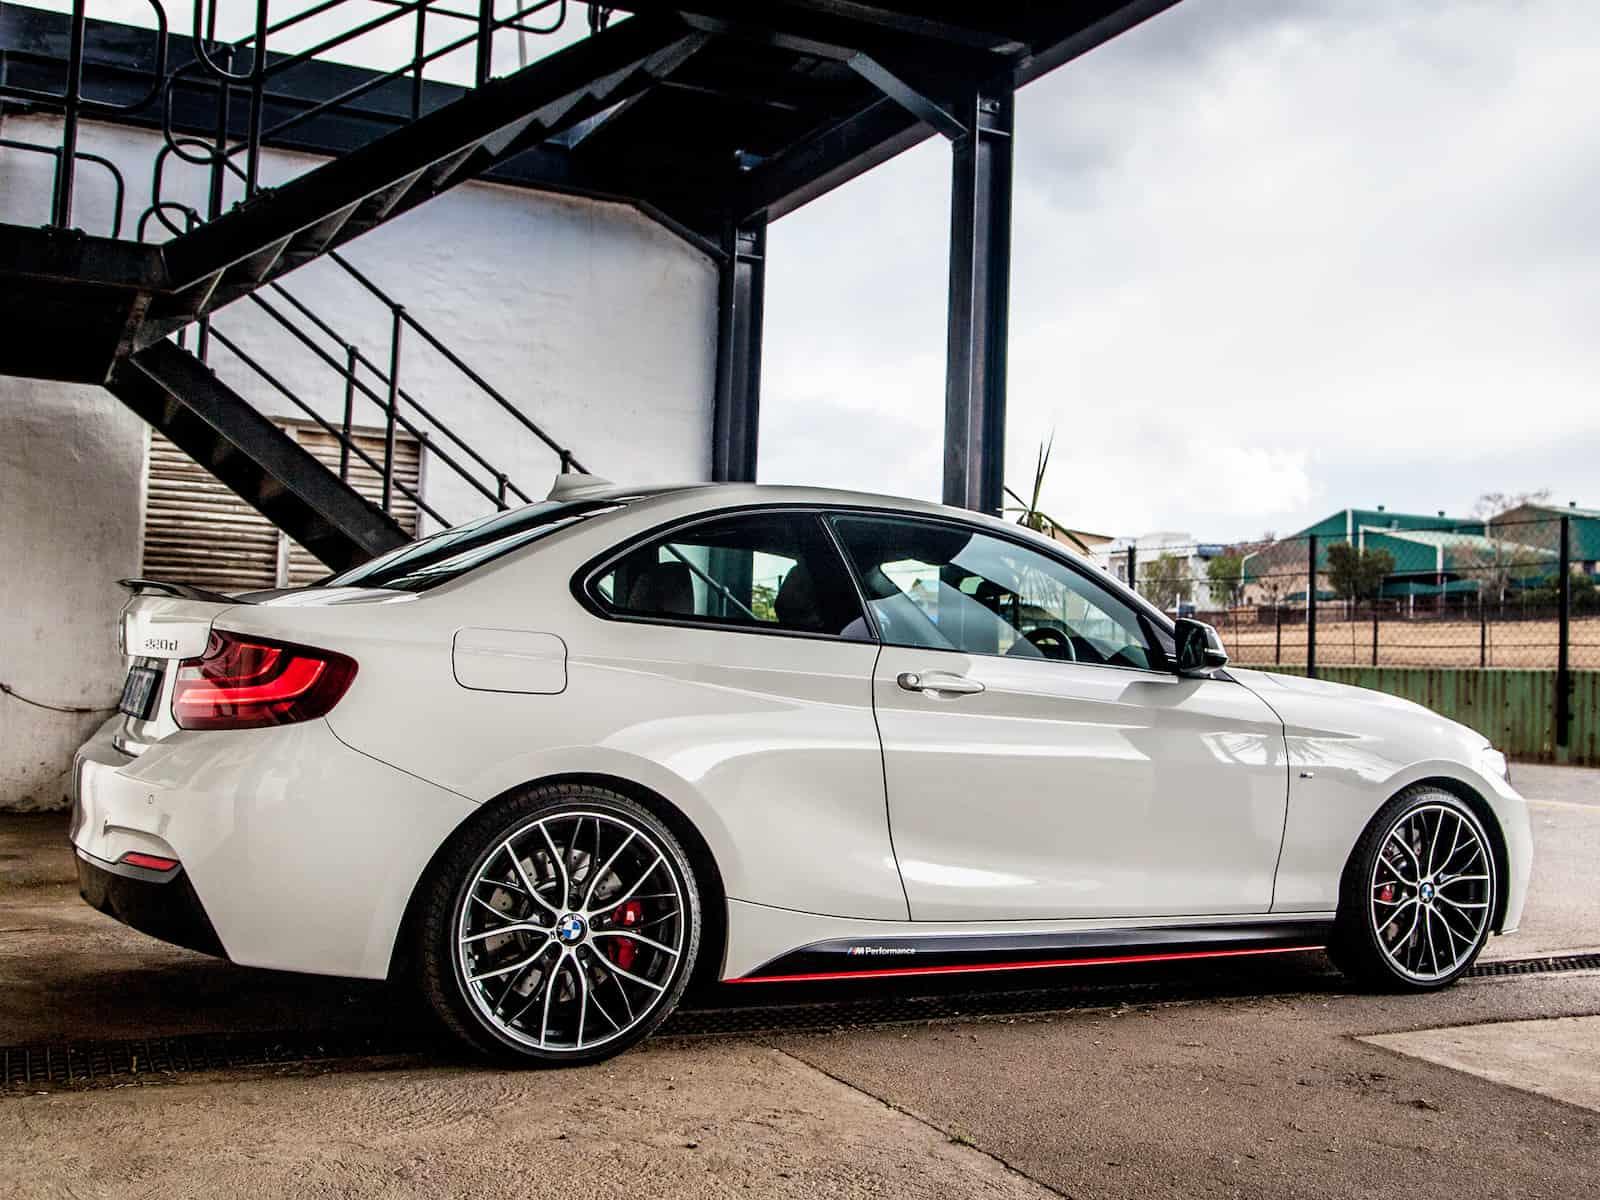 BMW 405M wheel style specs